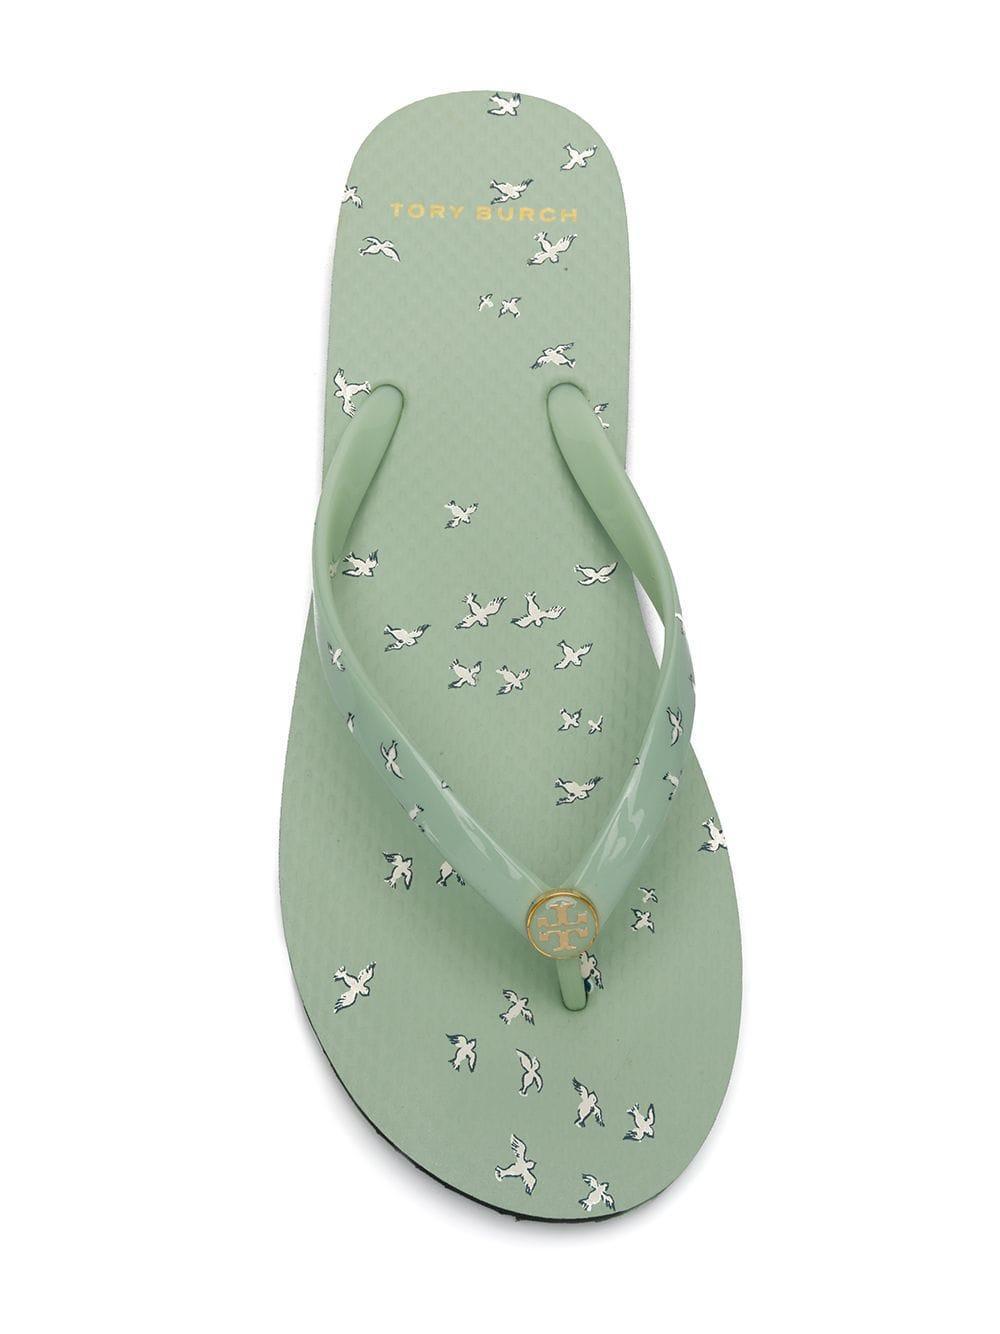 57d6c613da2193 Tory Burch - Green Flip-Flops mit Logo - Lyst. Vollbild ansehen